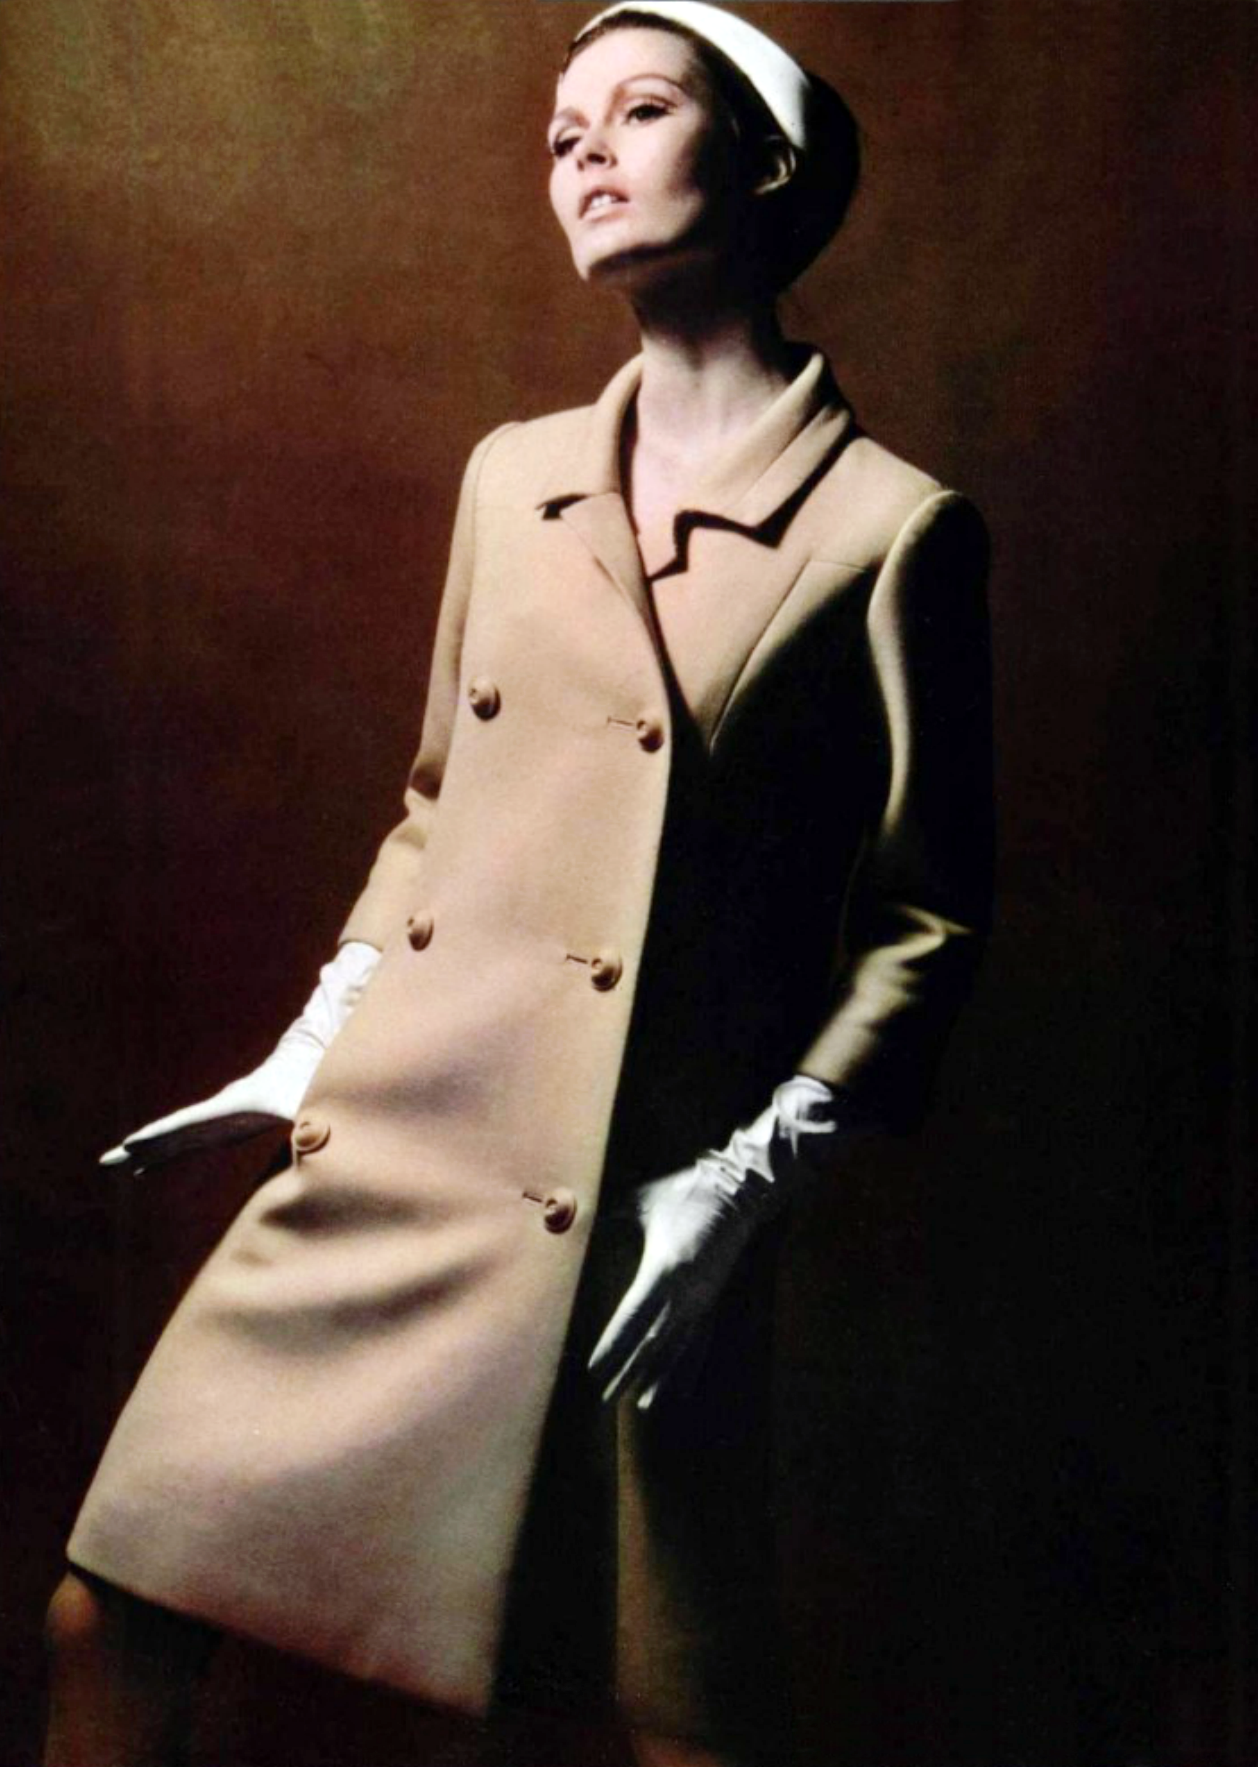 Castillo - L'officiel magazine 1966